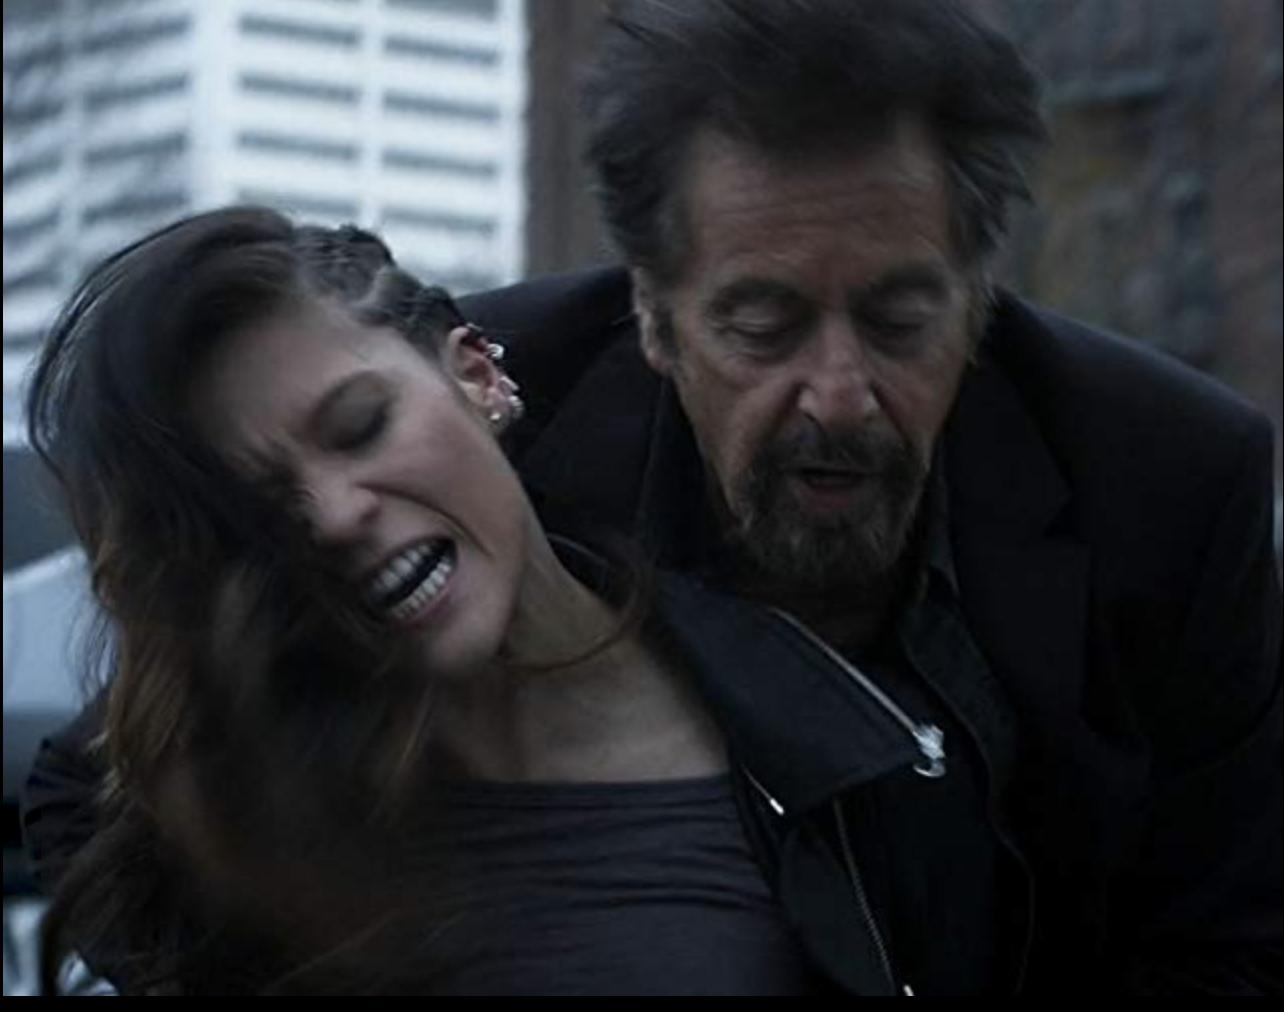 Still of Chelle Ramos and Al Pacino